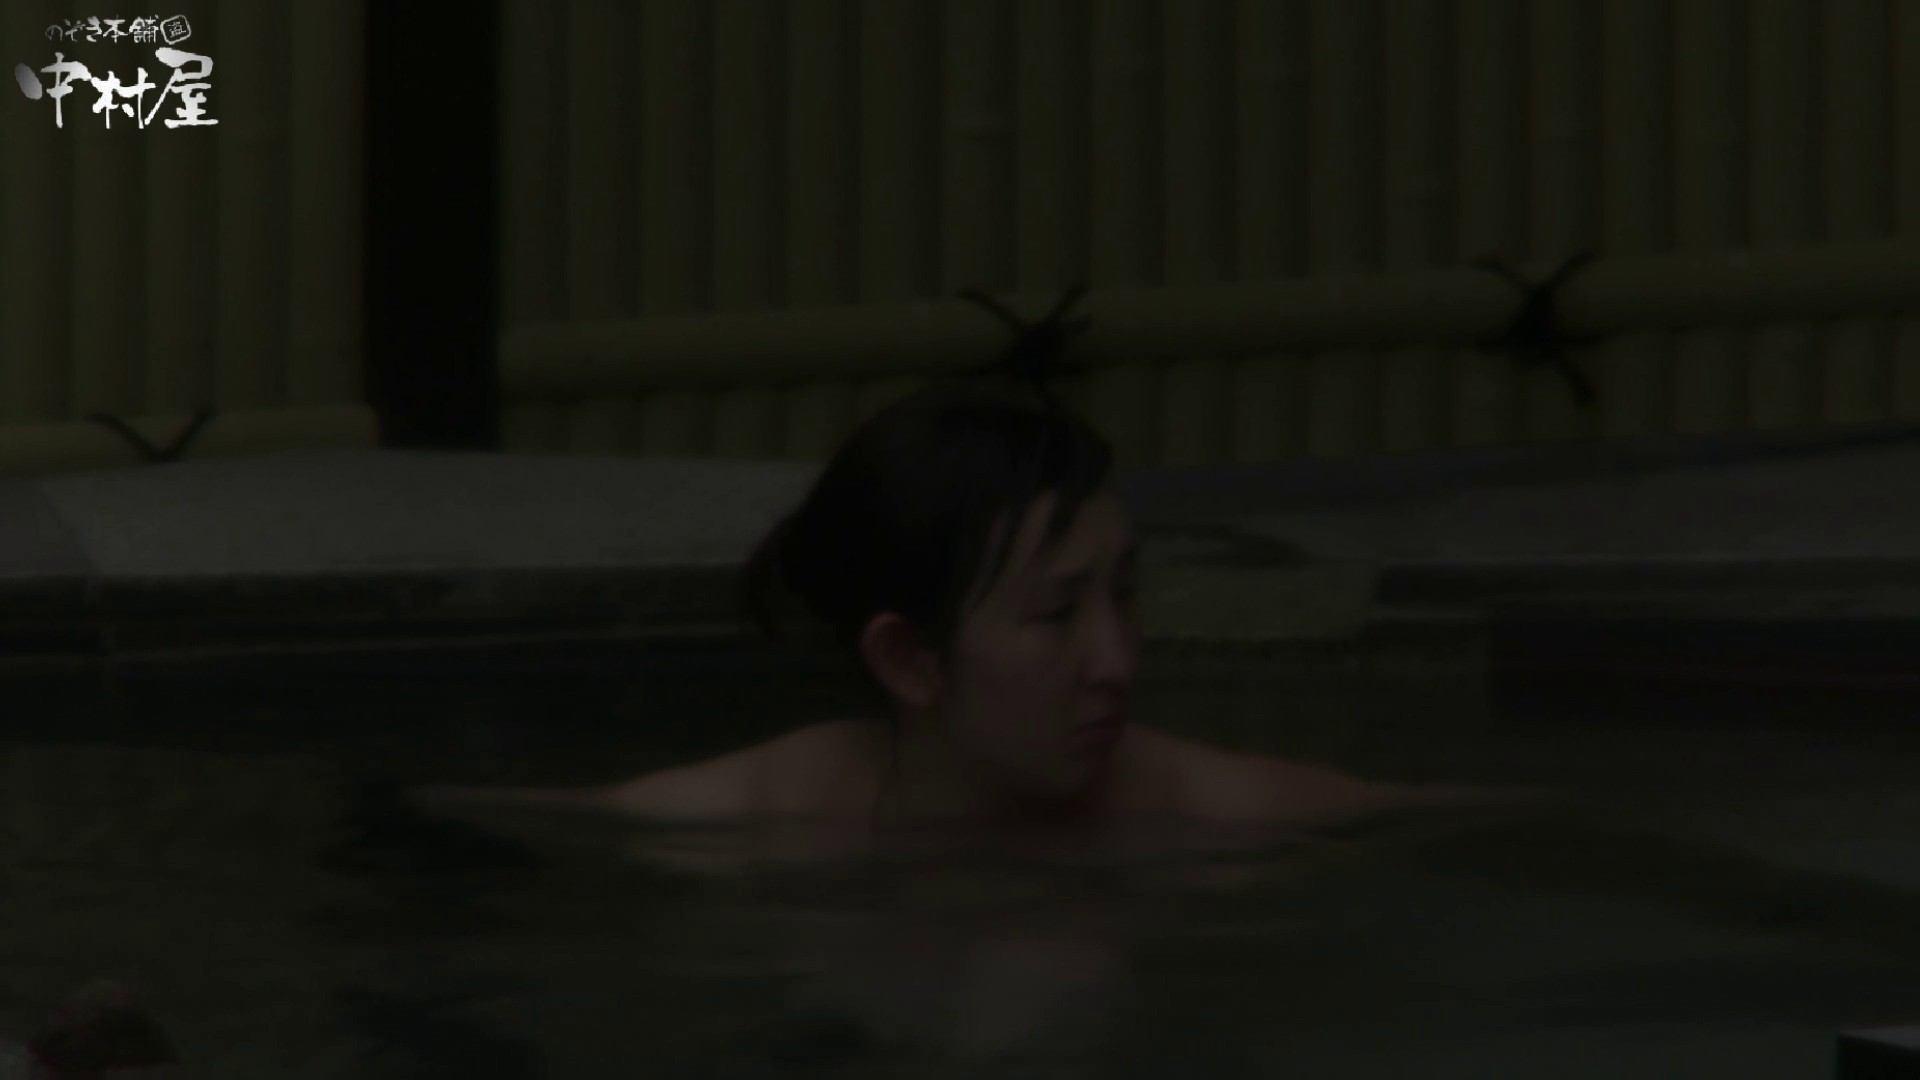 Aquaな露天風呂Vol.948 盗撮   HなOL  78pic 1